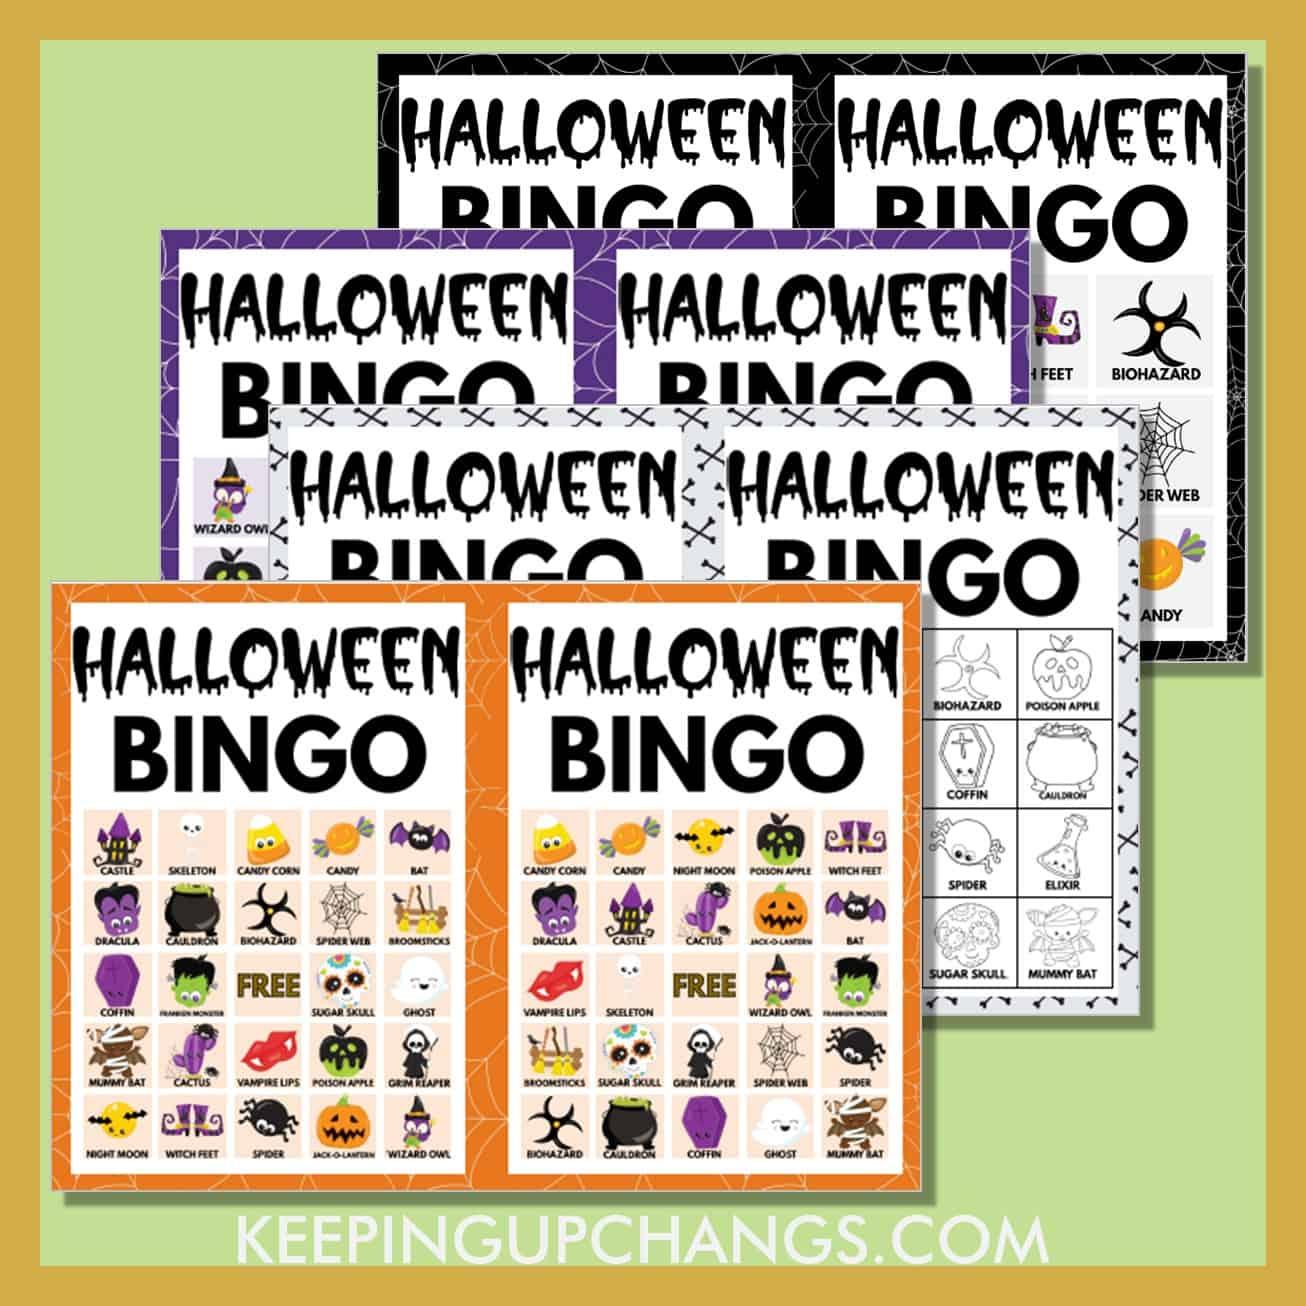 most popular free halloween bingo games including 5x5, 4x4, 3x3 grids.